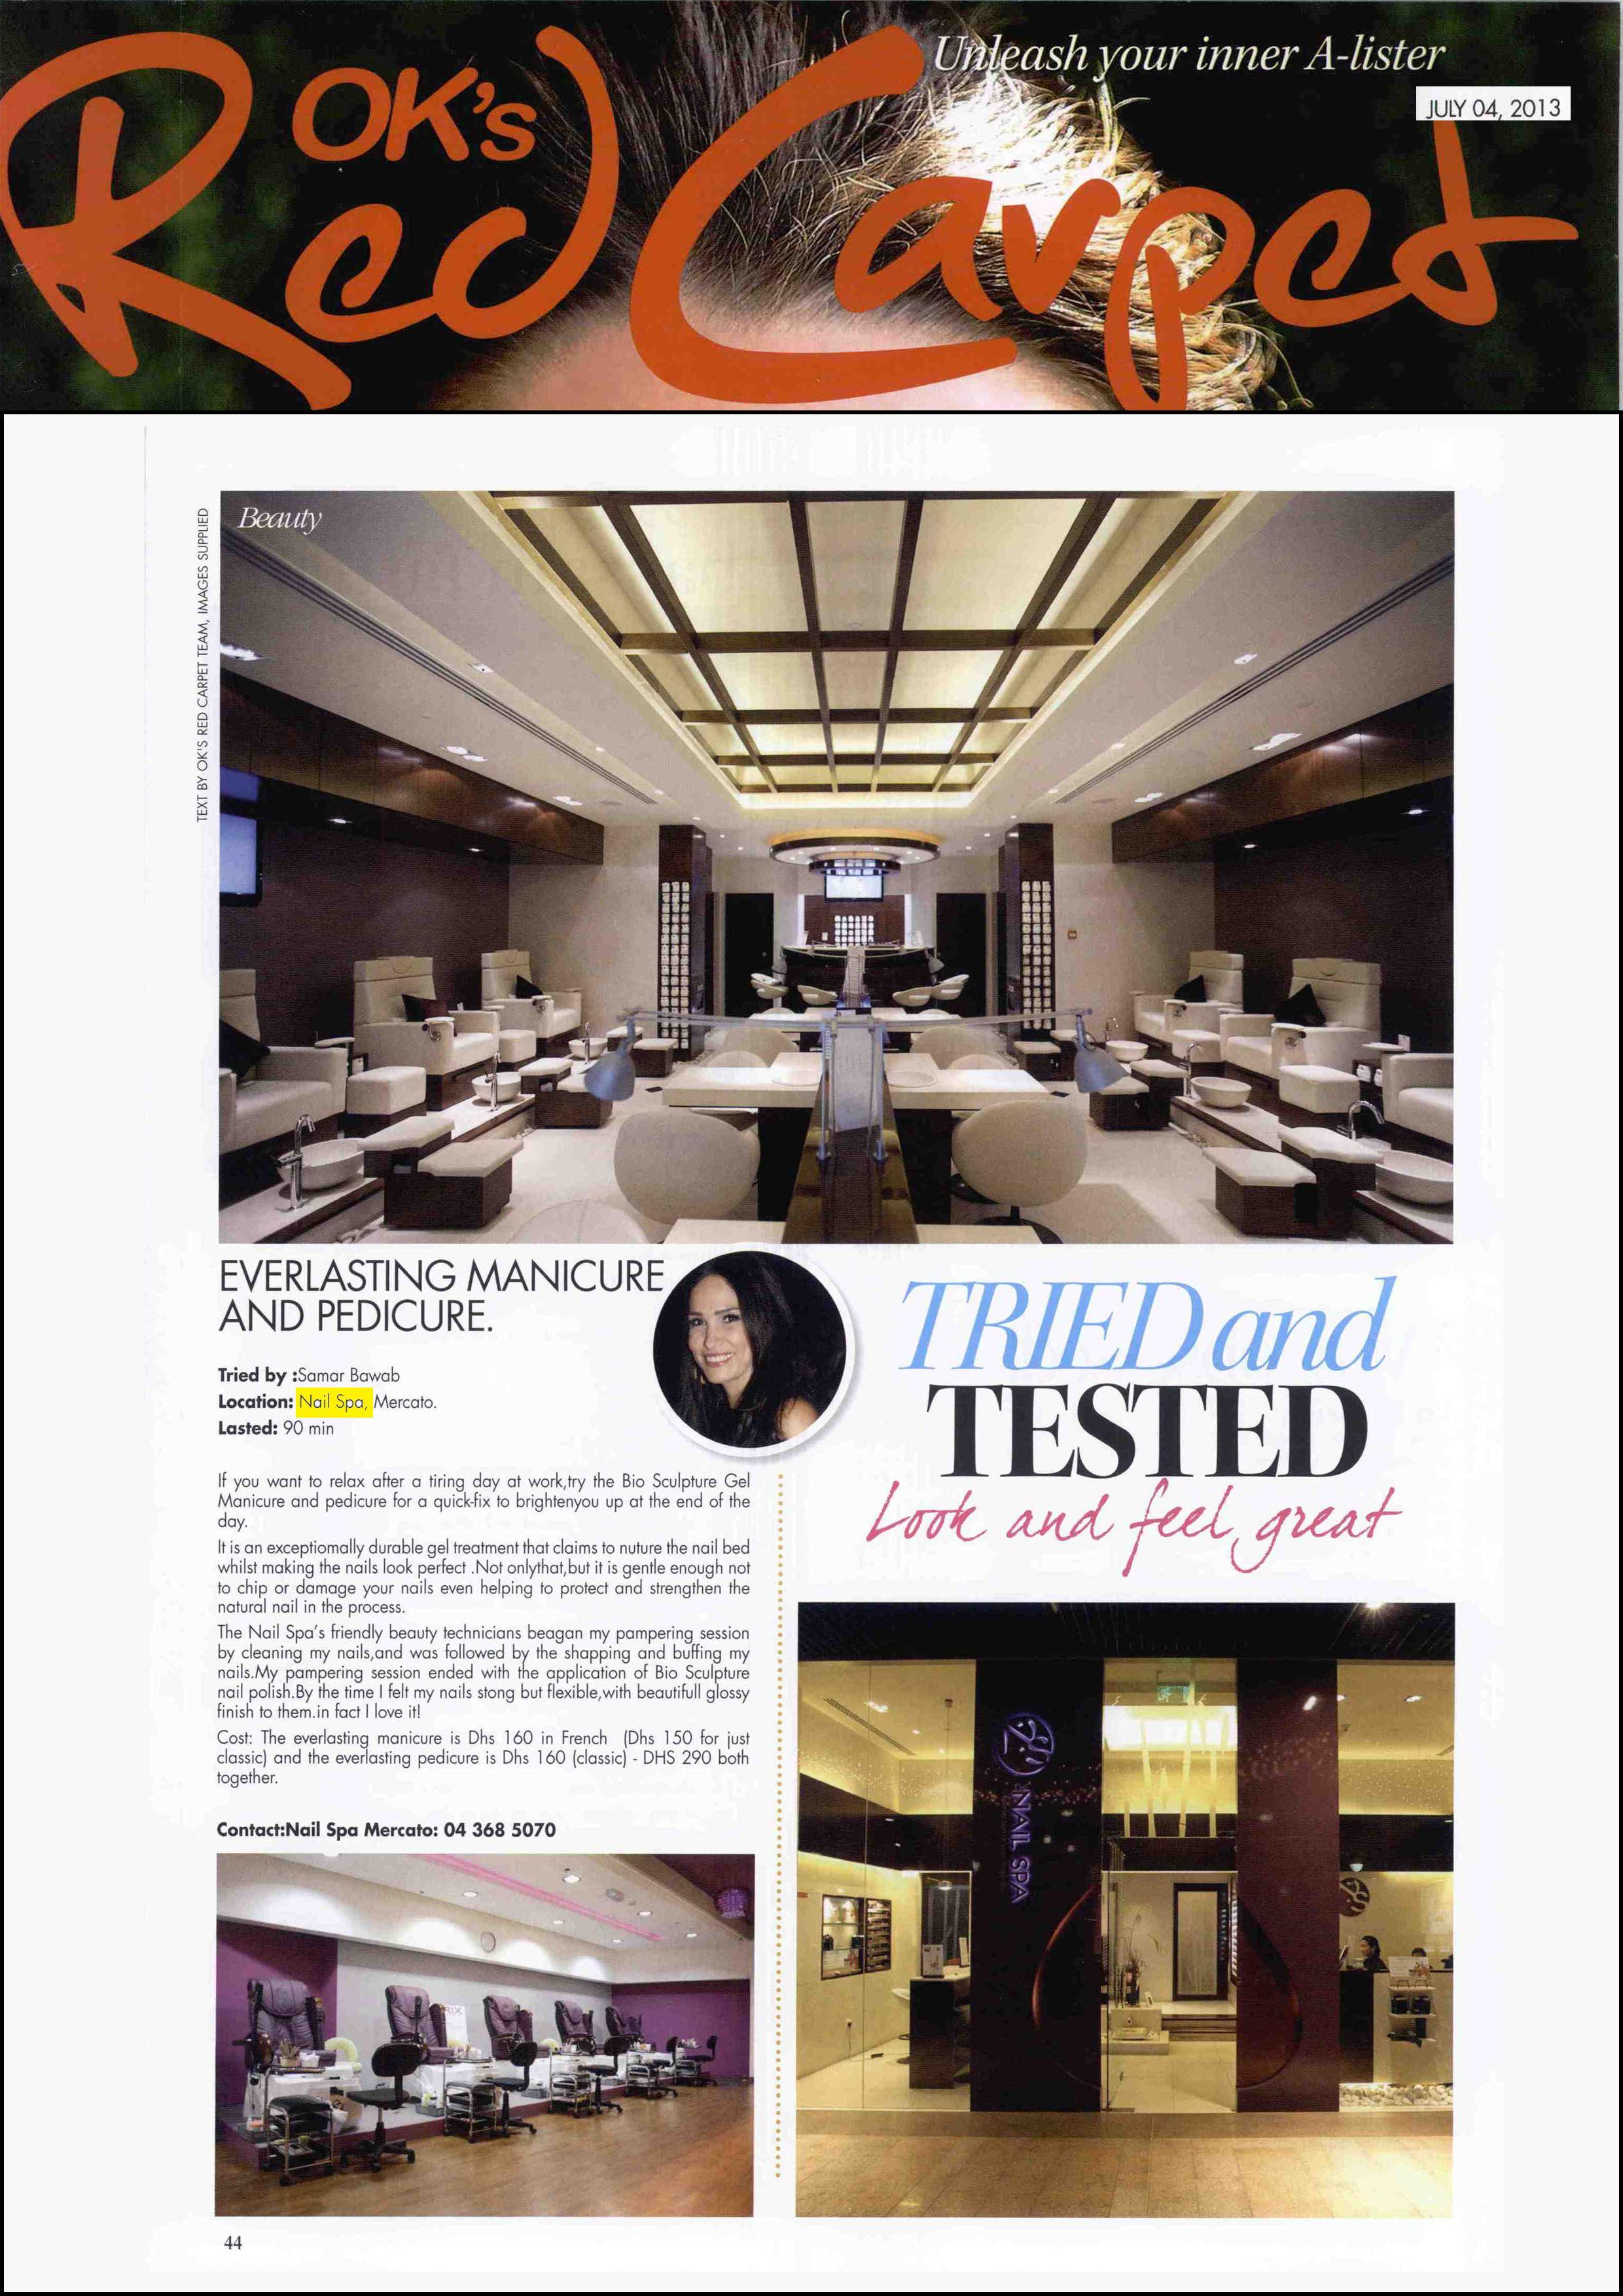 Ok S Red Carpet Magazine Jul 2013 Www Thenailspa Com Salon In Dubai Nail Spa Nail Salon Red nail salon dubai read reviews and